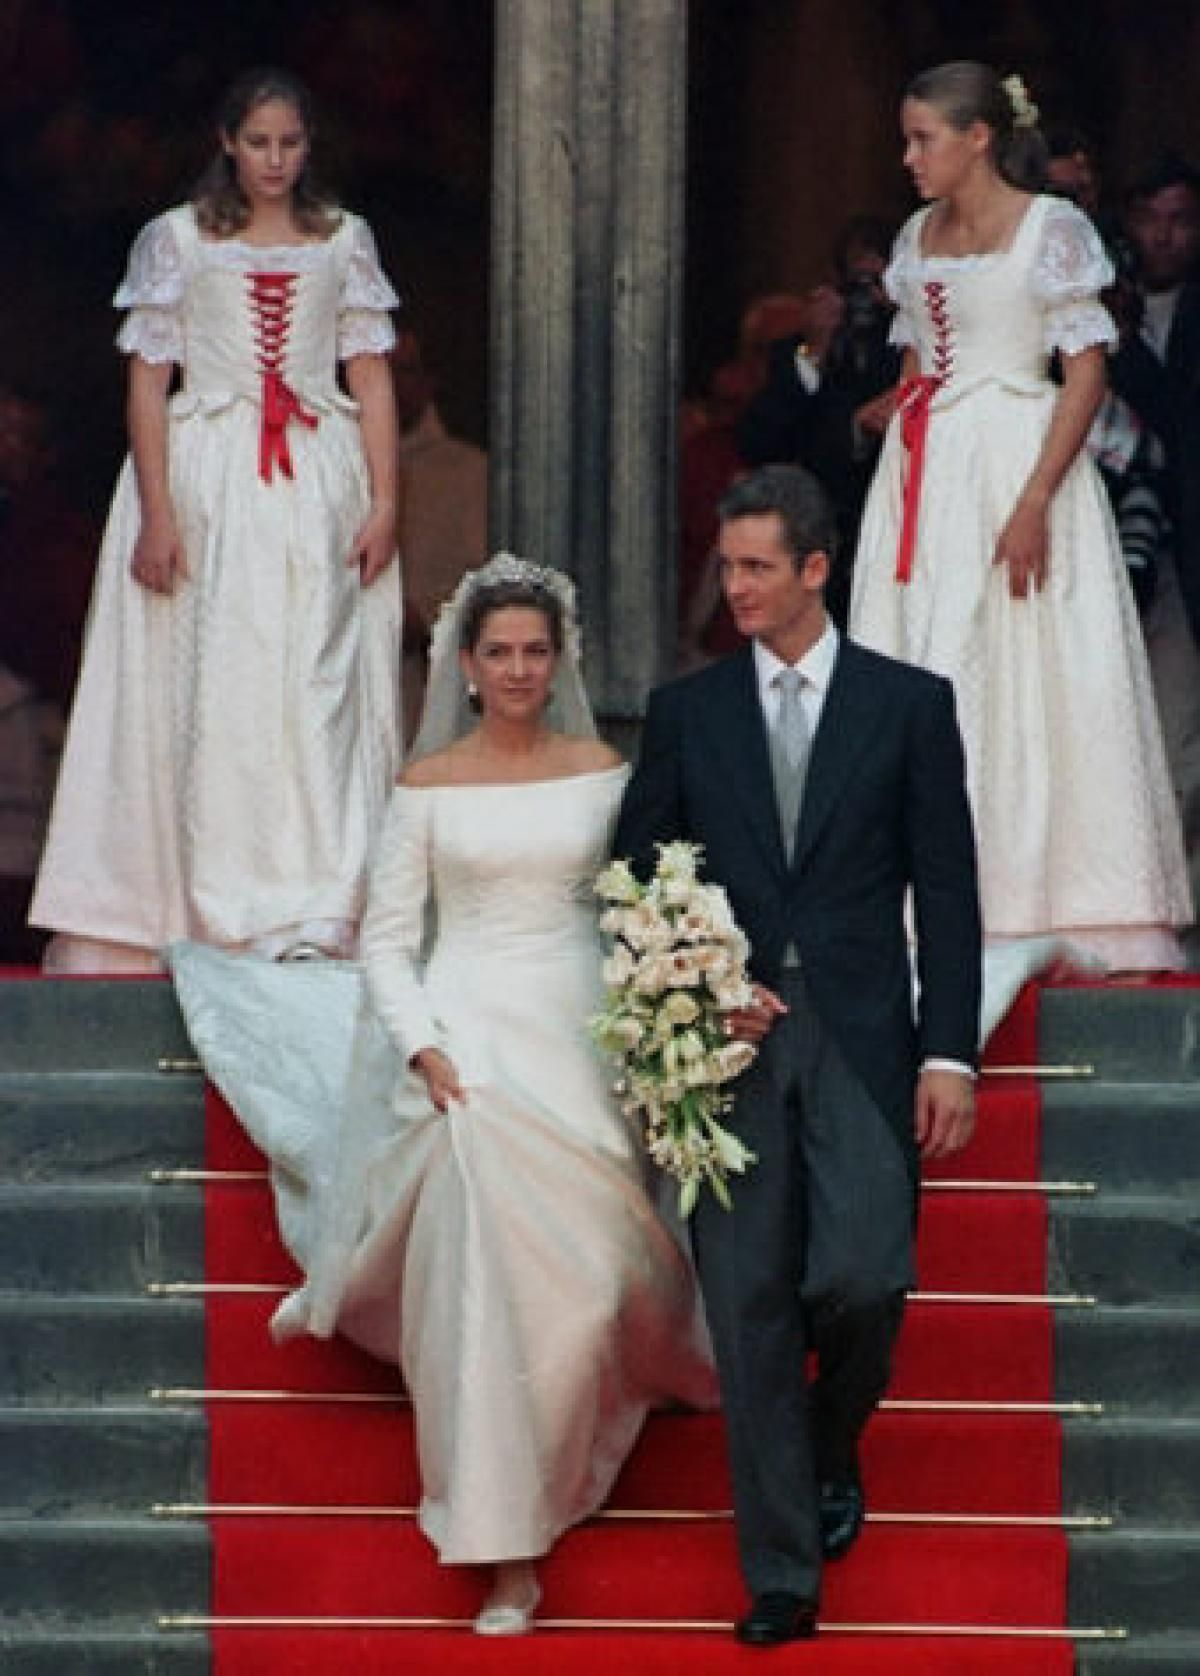 Princess Cristina And Prince Inaki Urdangarin Of Spainthe Youngest Daughter King Juan Carlos I